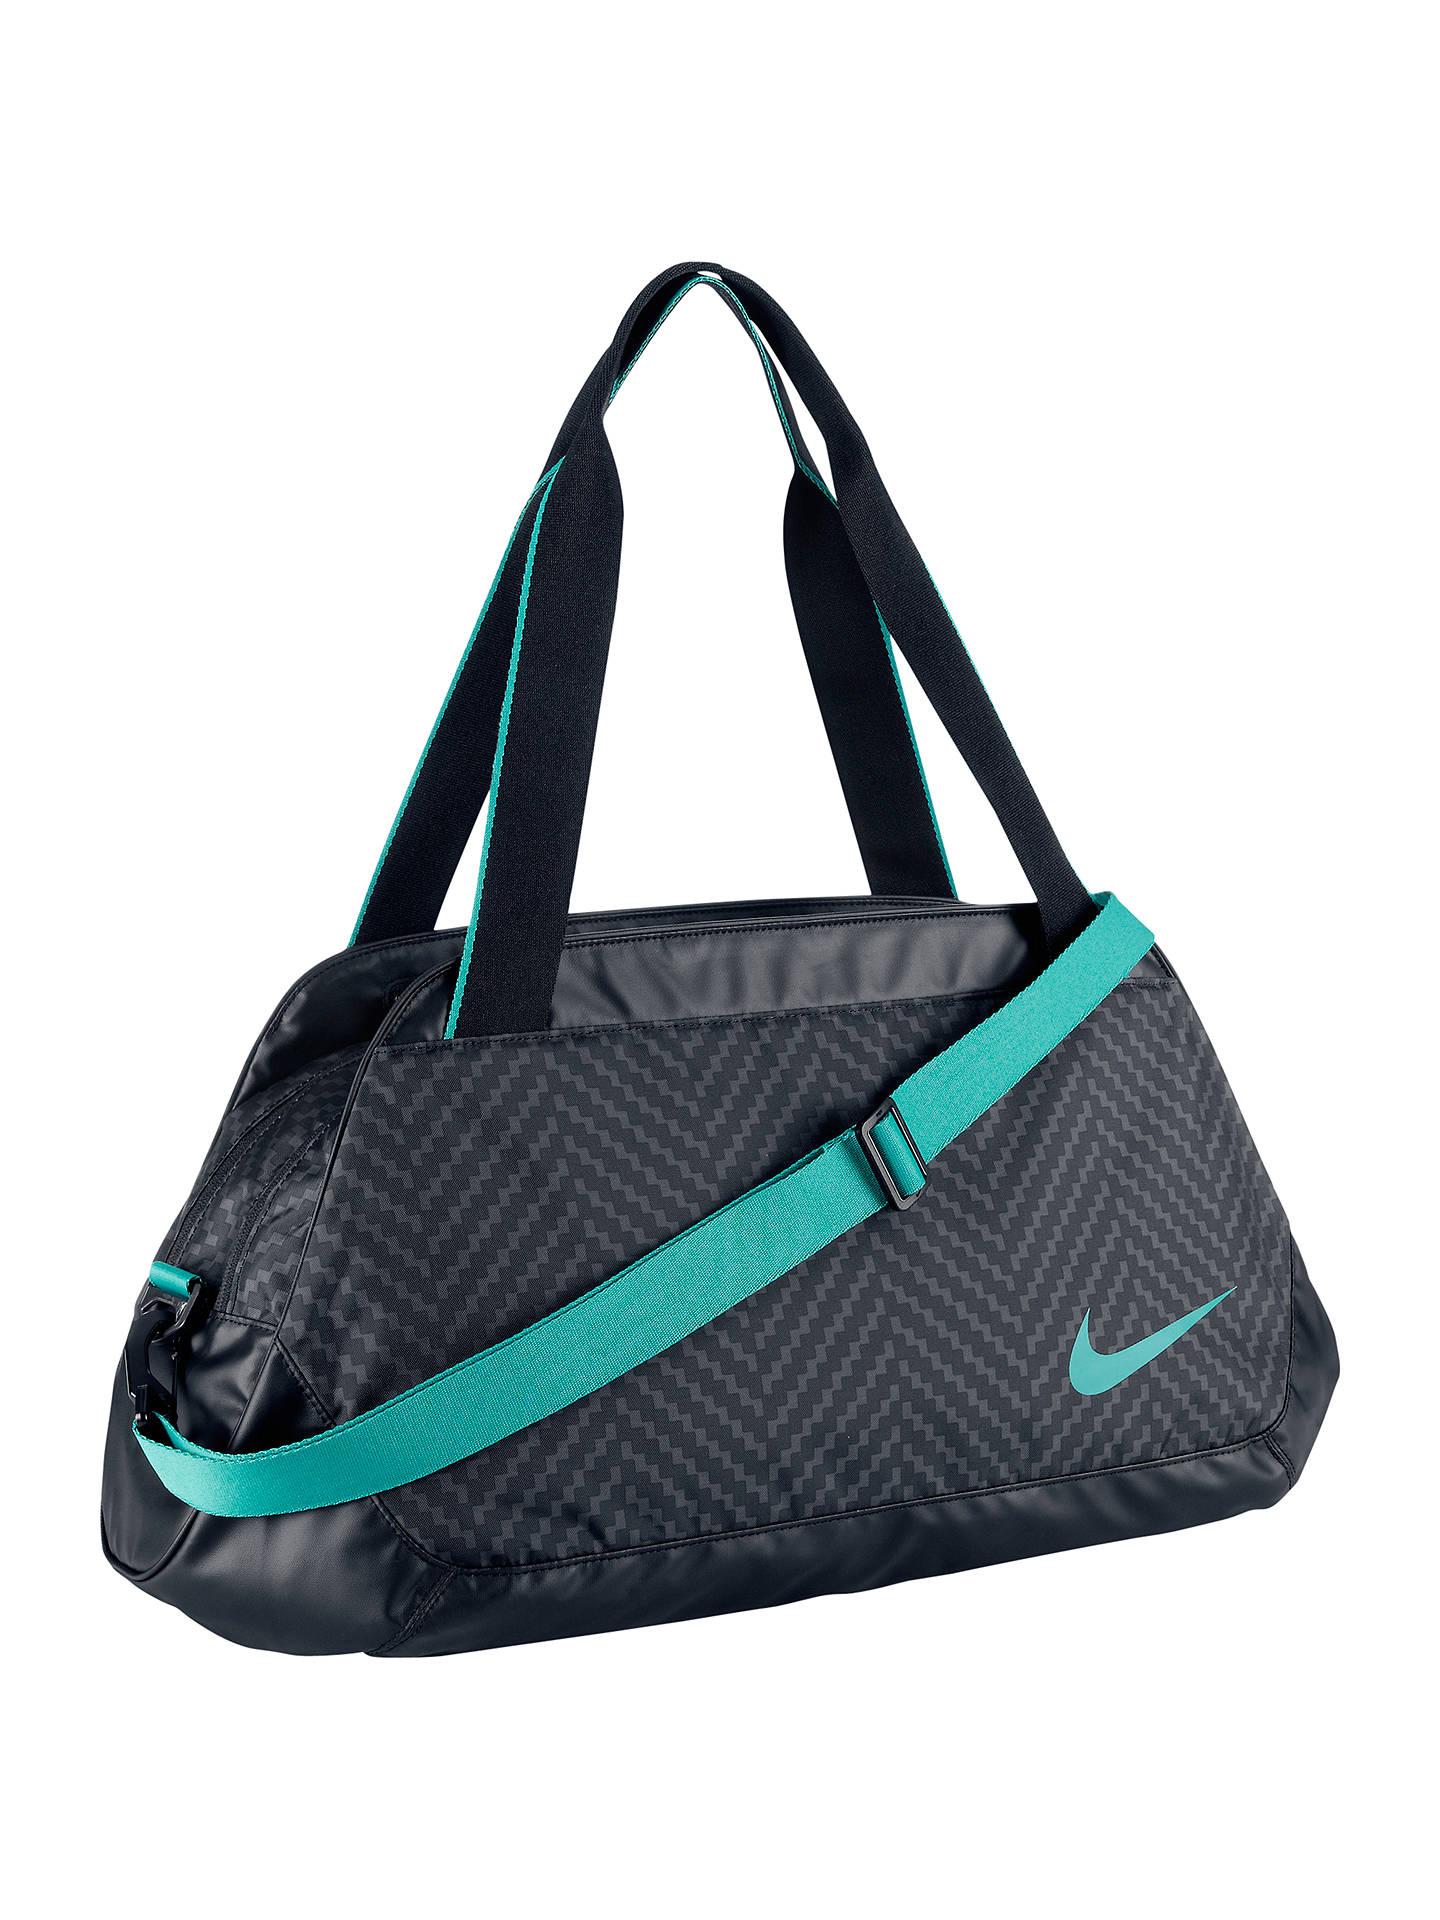 Anoi Garganta gradualmente  Nike C72 Legend 2.0 Medium Gym Holdall at John Lewis & Partners